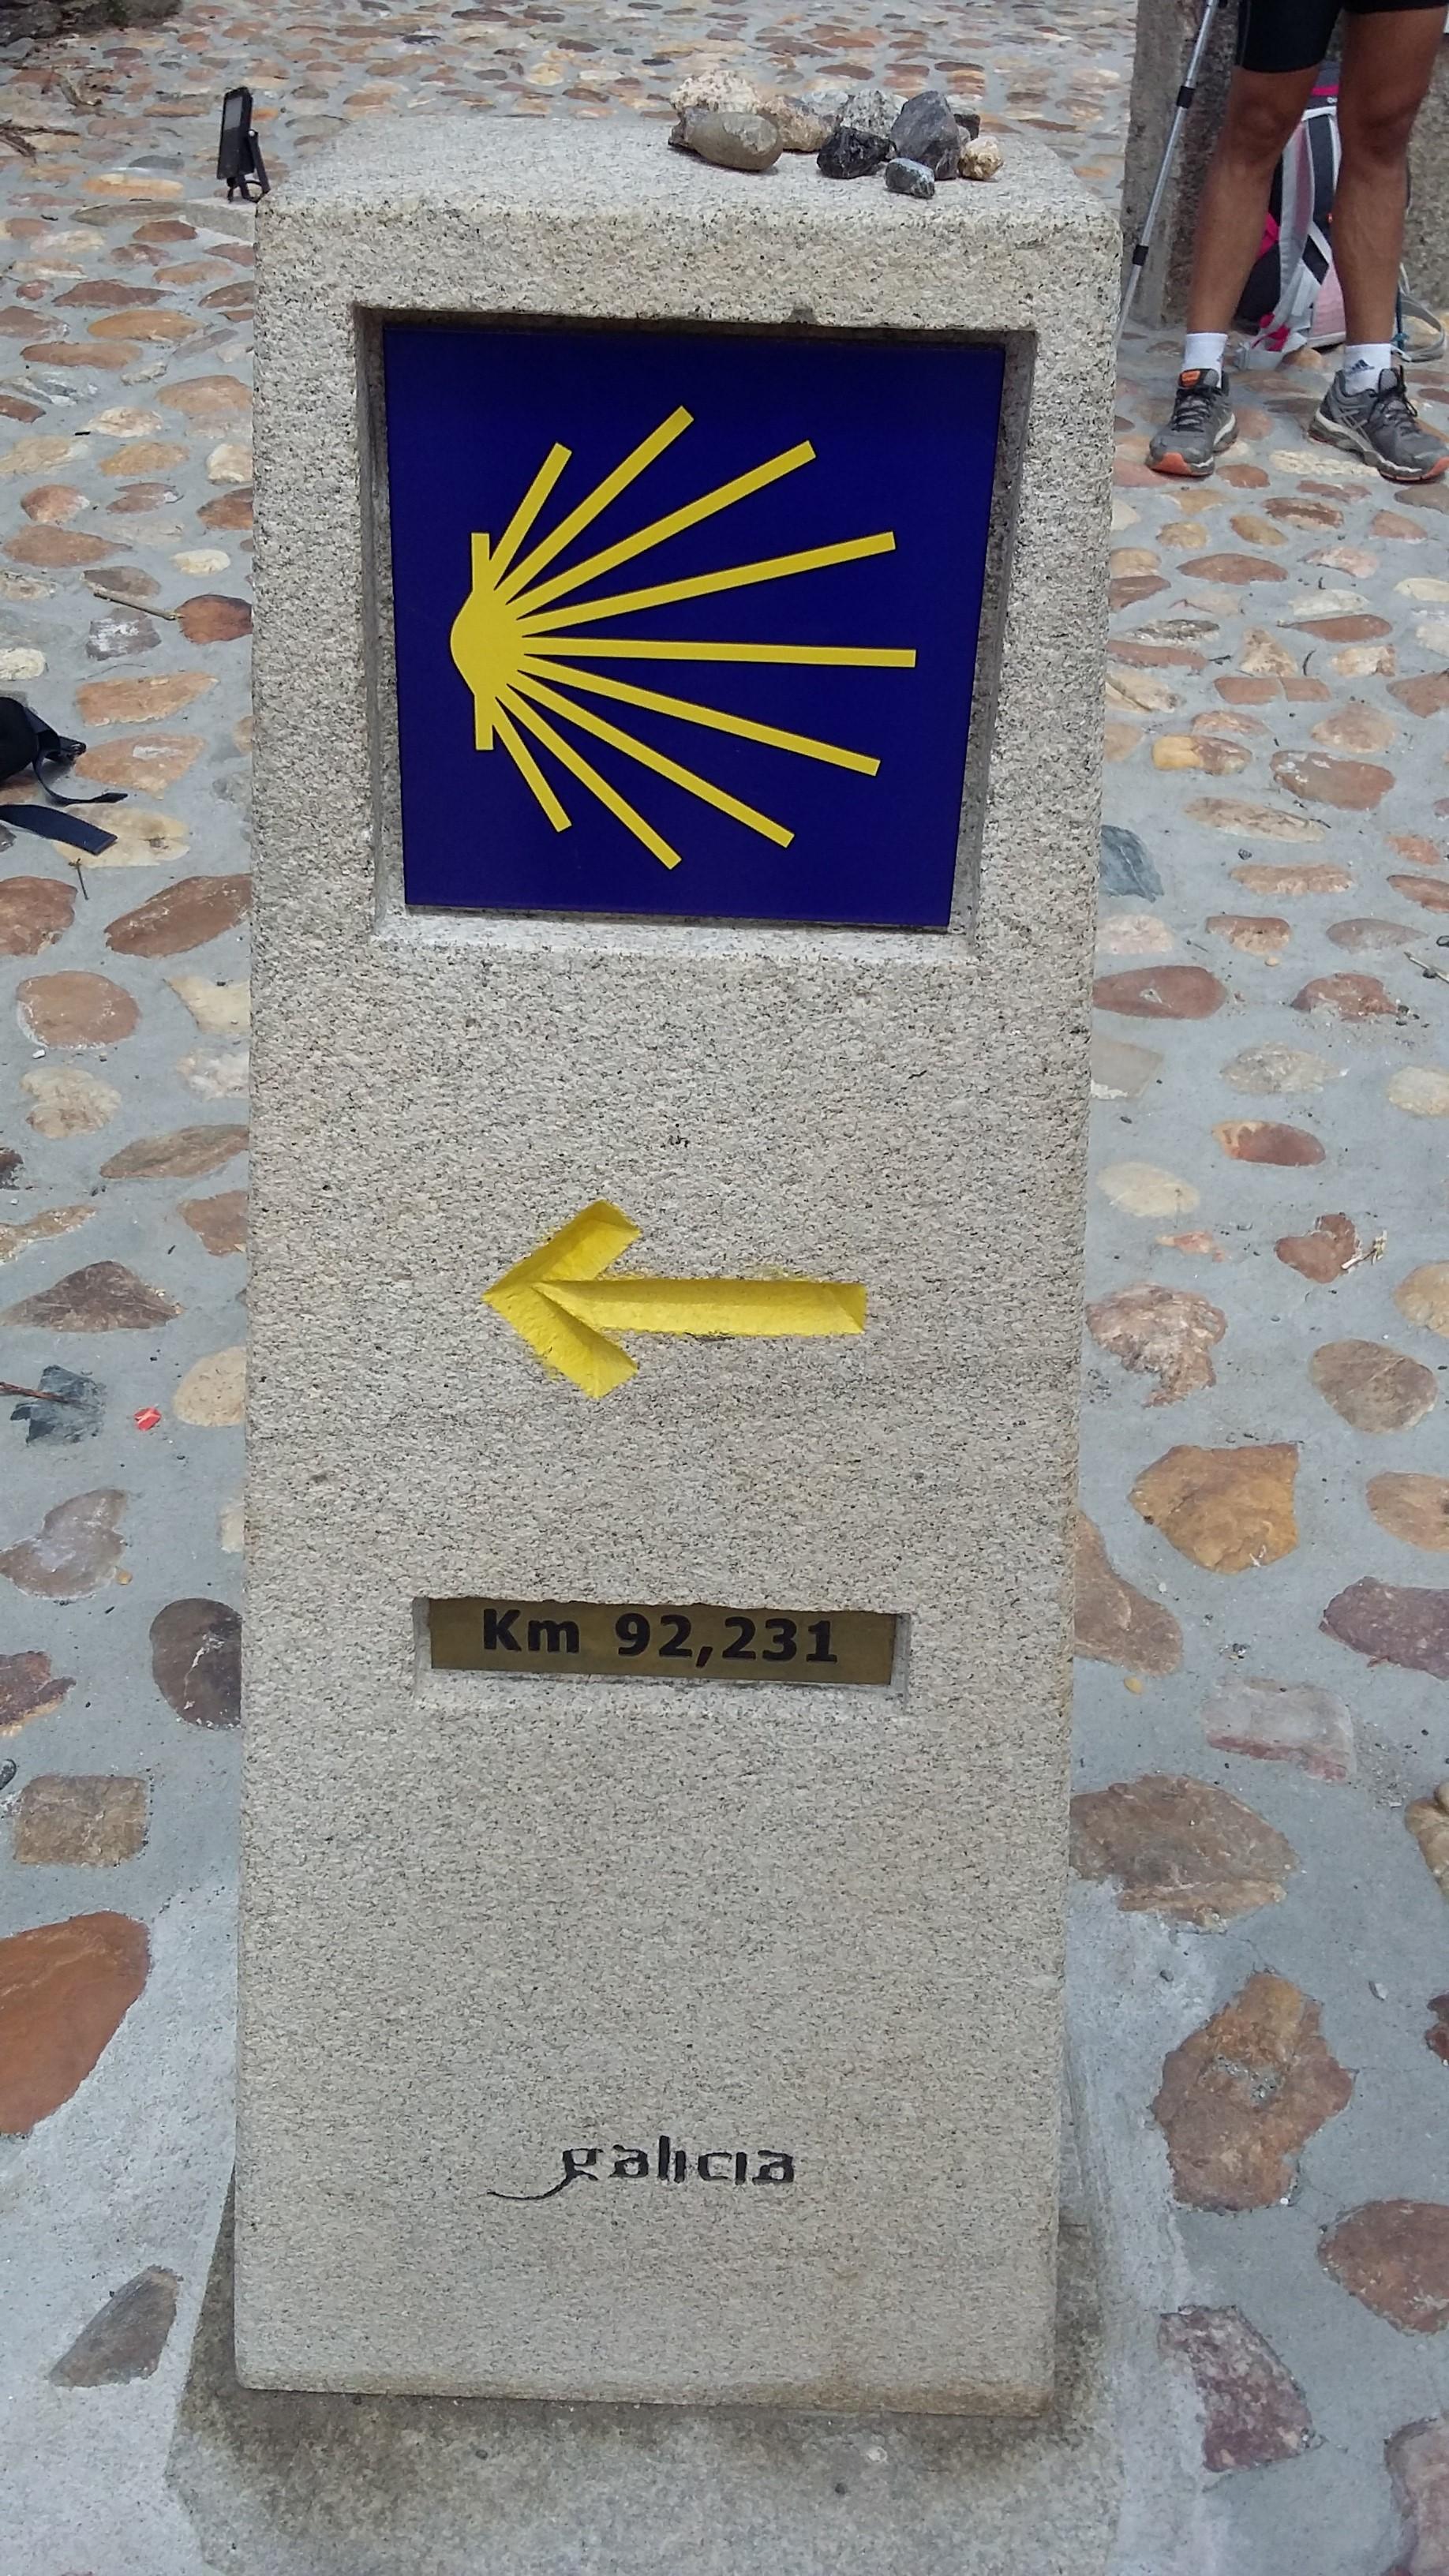 Portomarinban Santiago de Compostela 100 km-en belül